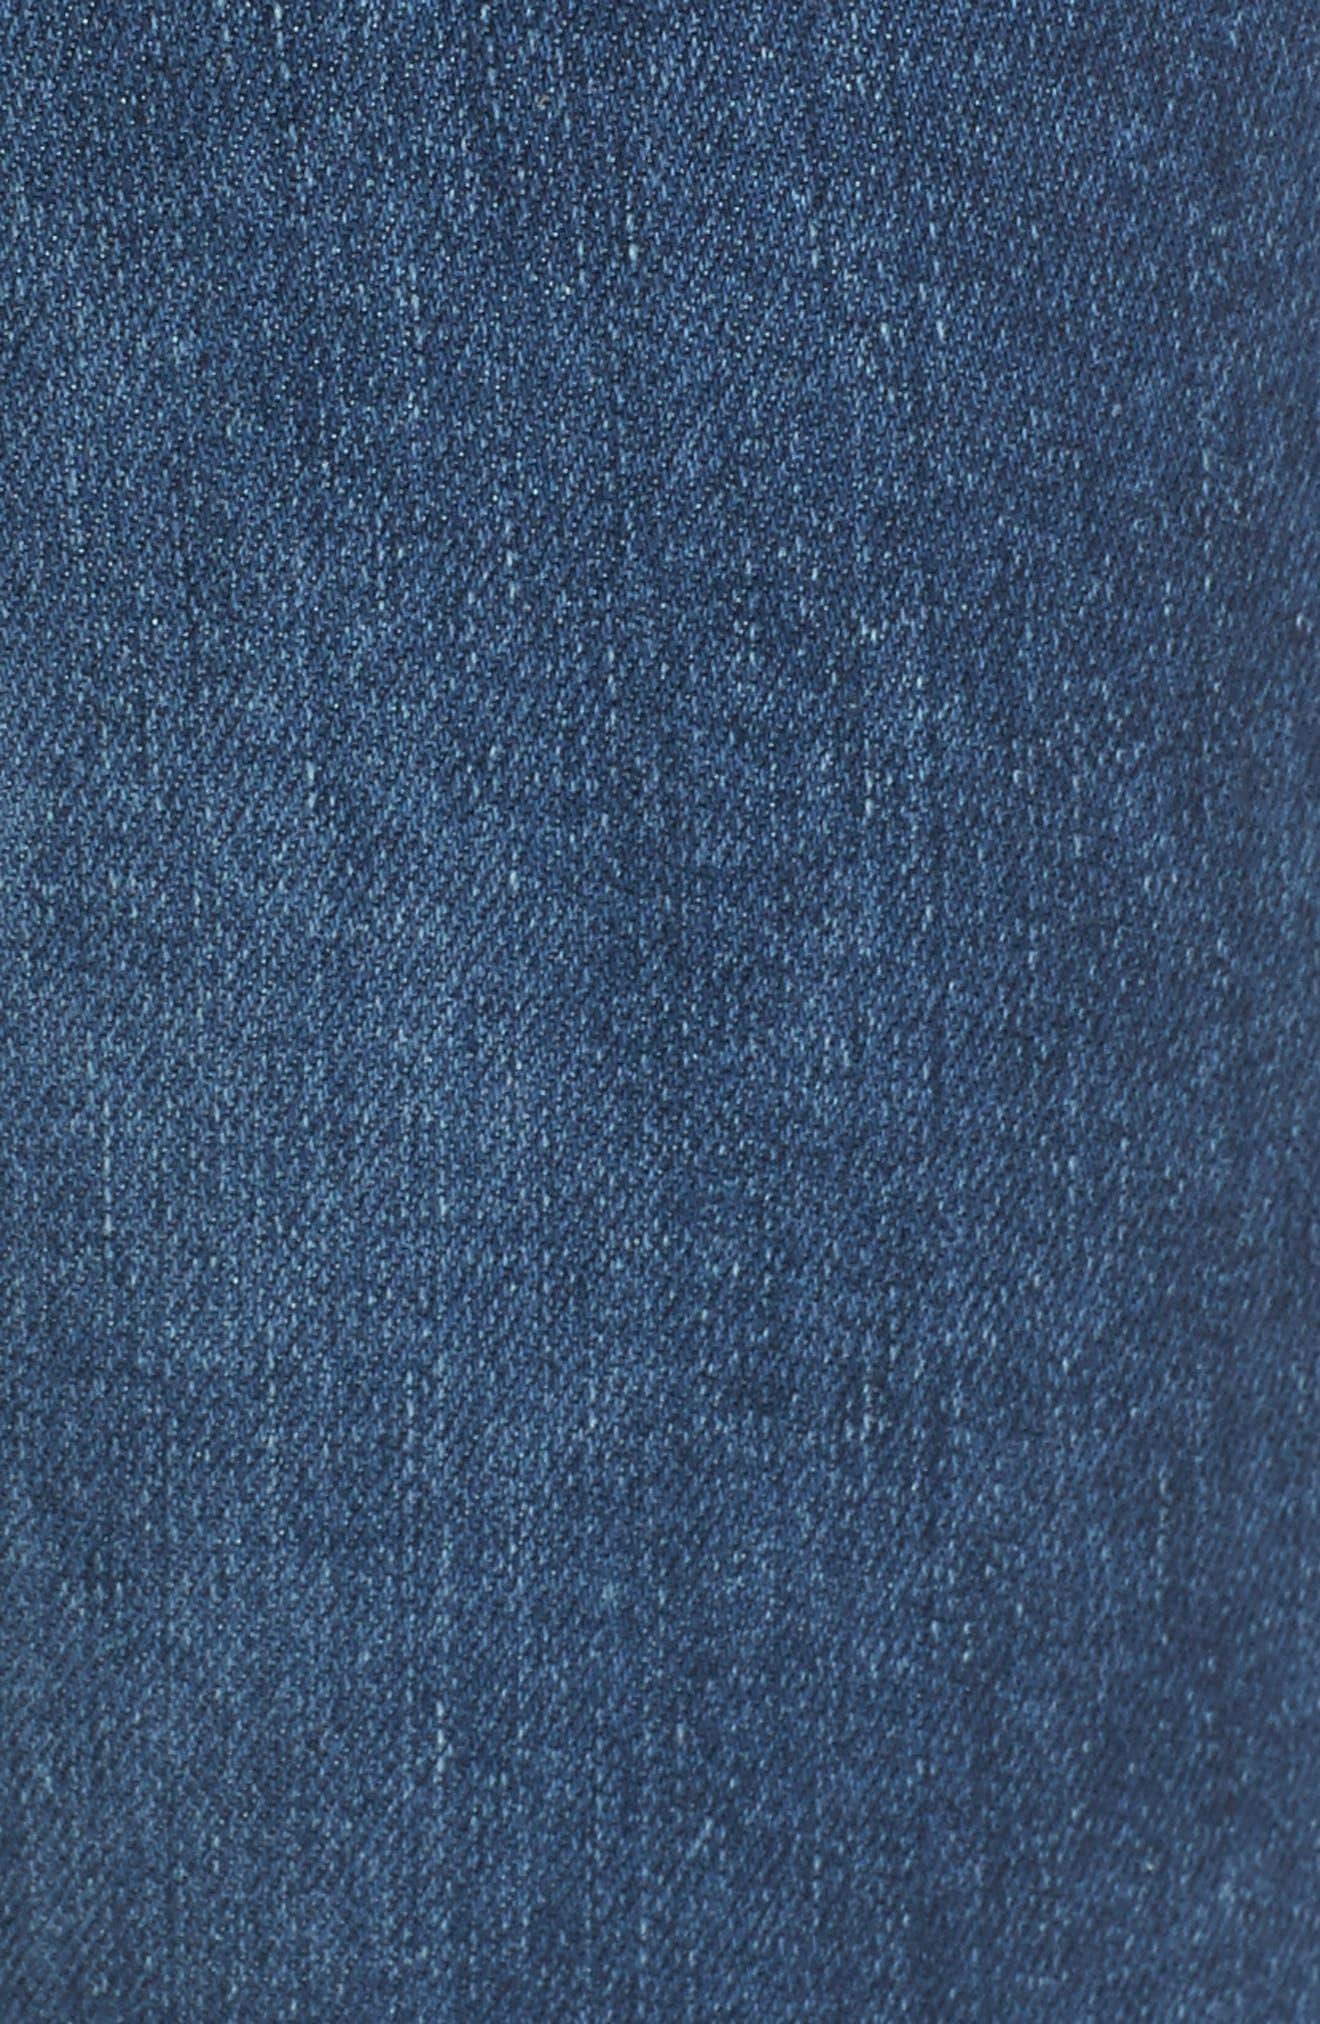 Chrissy High Waist Skinny Jeans,                             Alternate thumbnail 5, color,                             455